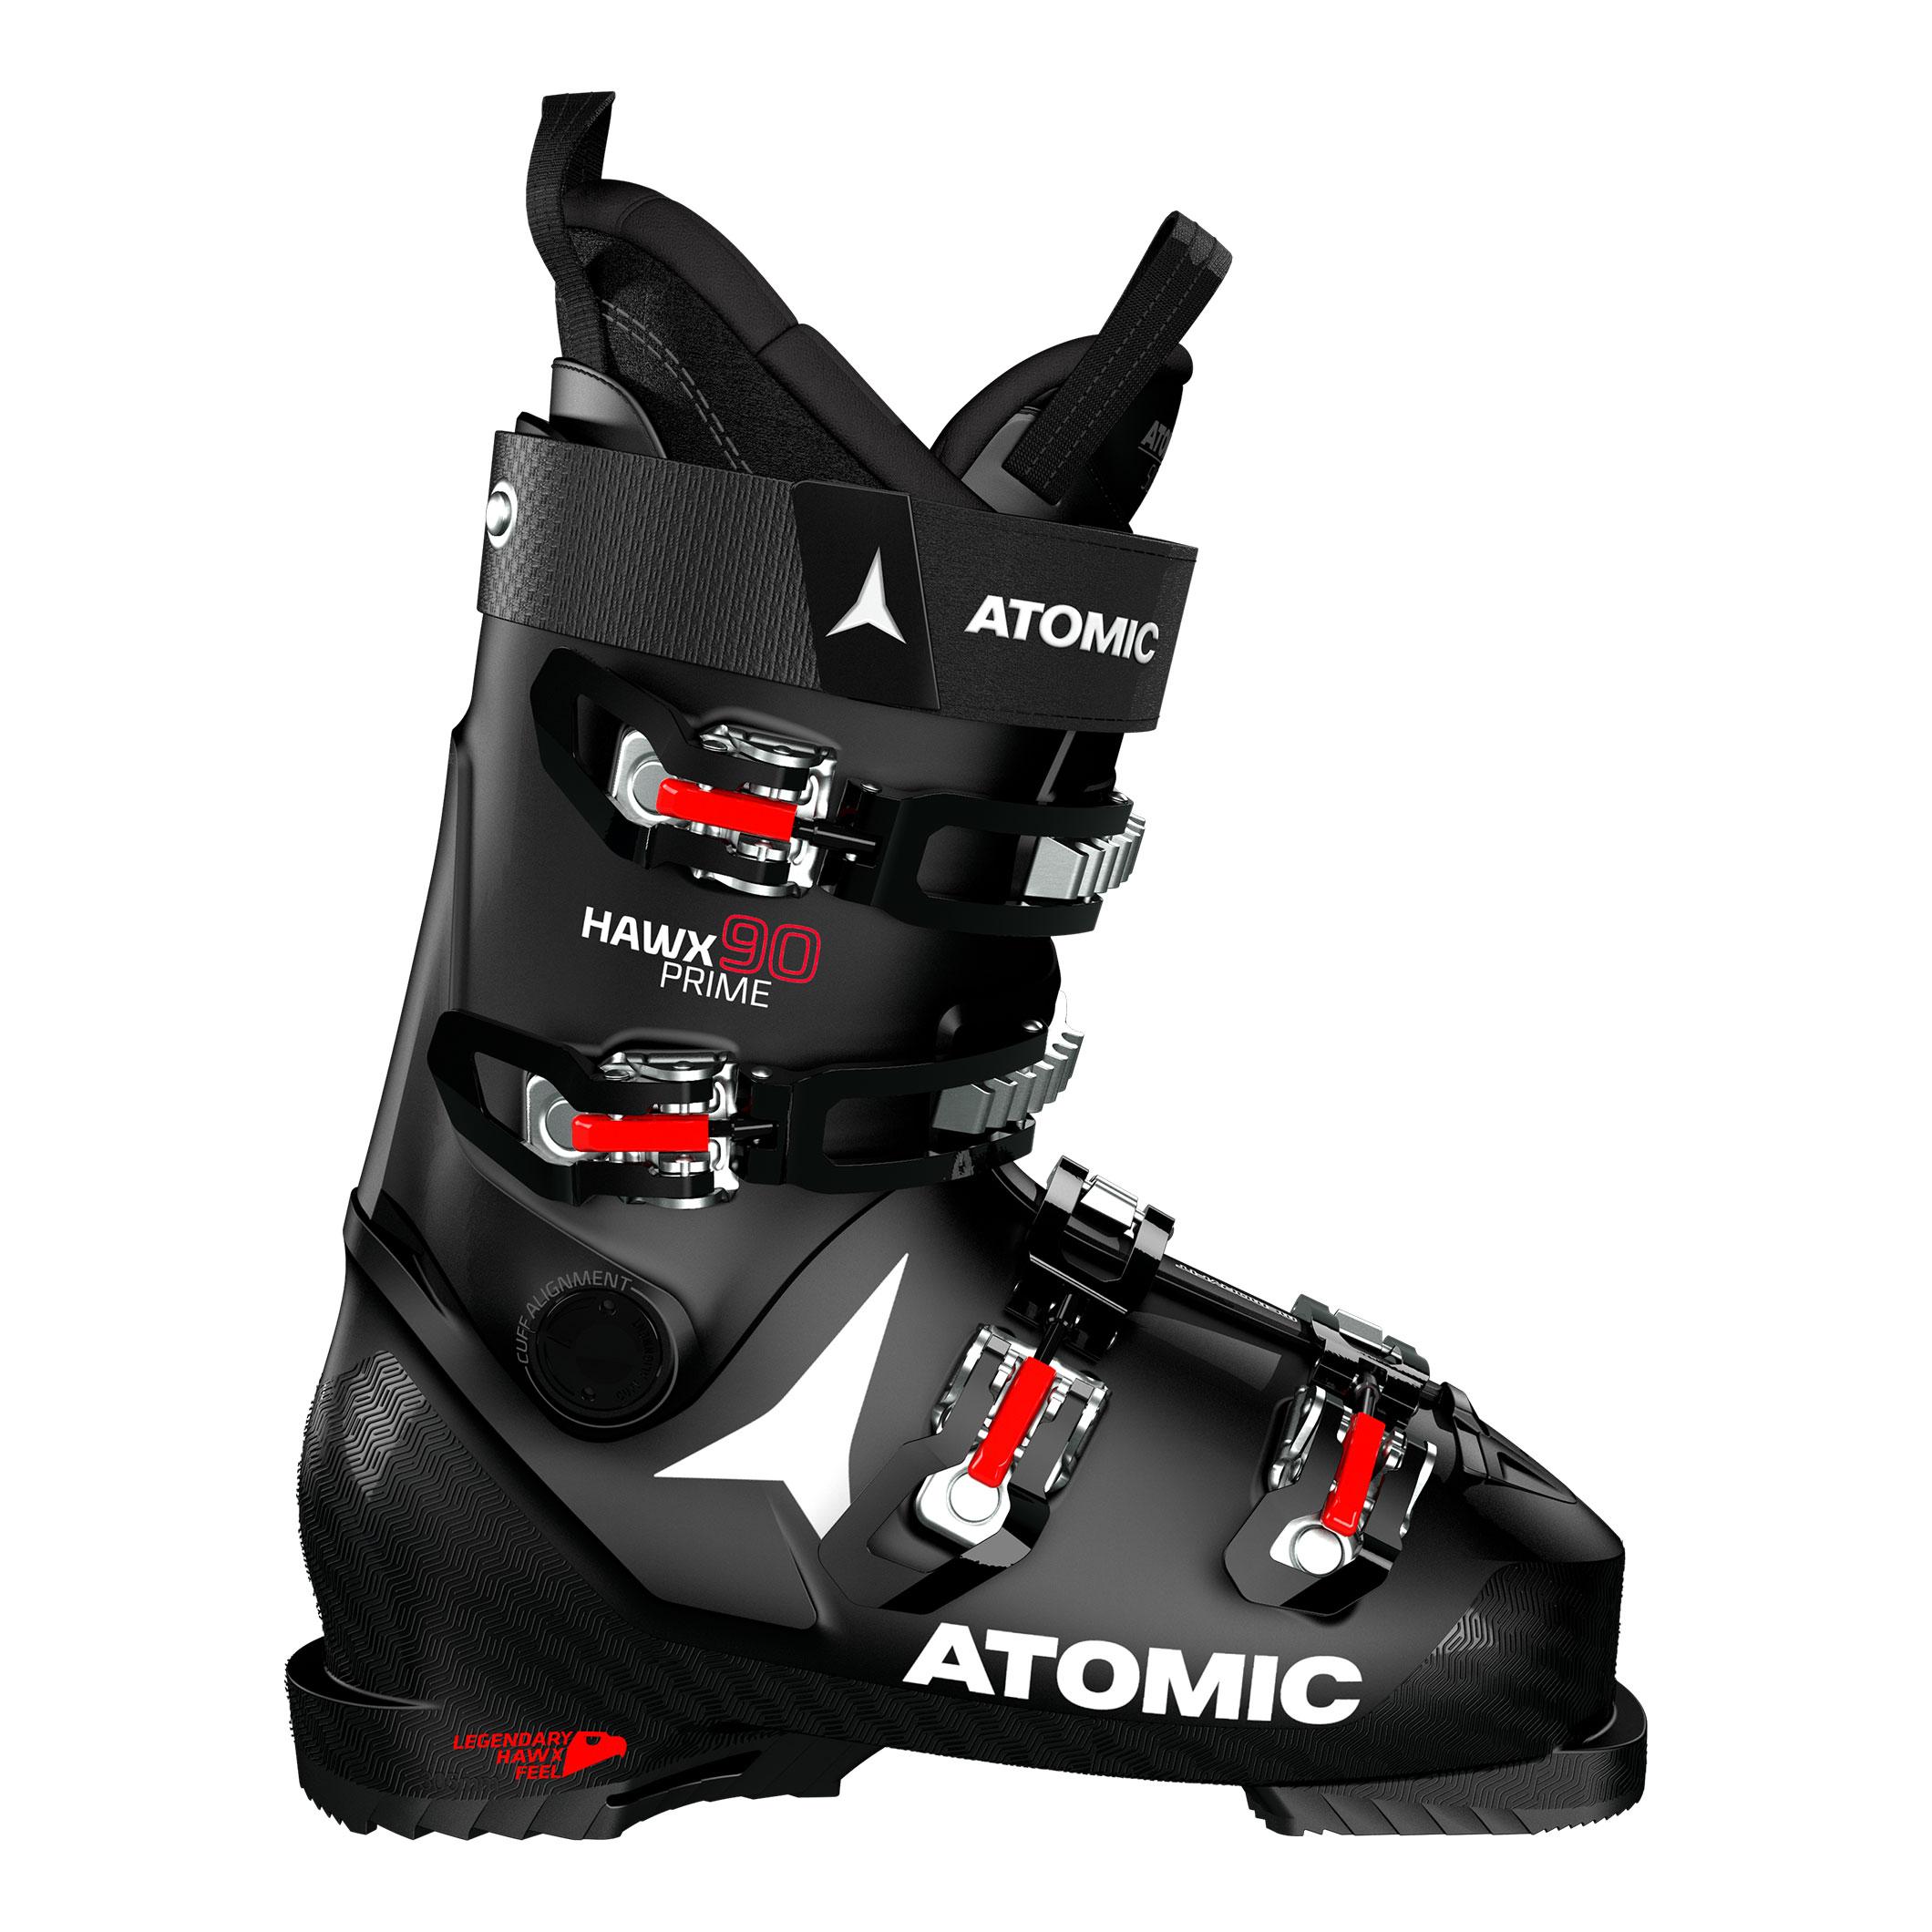 Atomic Hawx Prime 90 2022